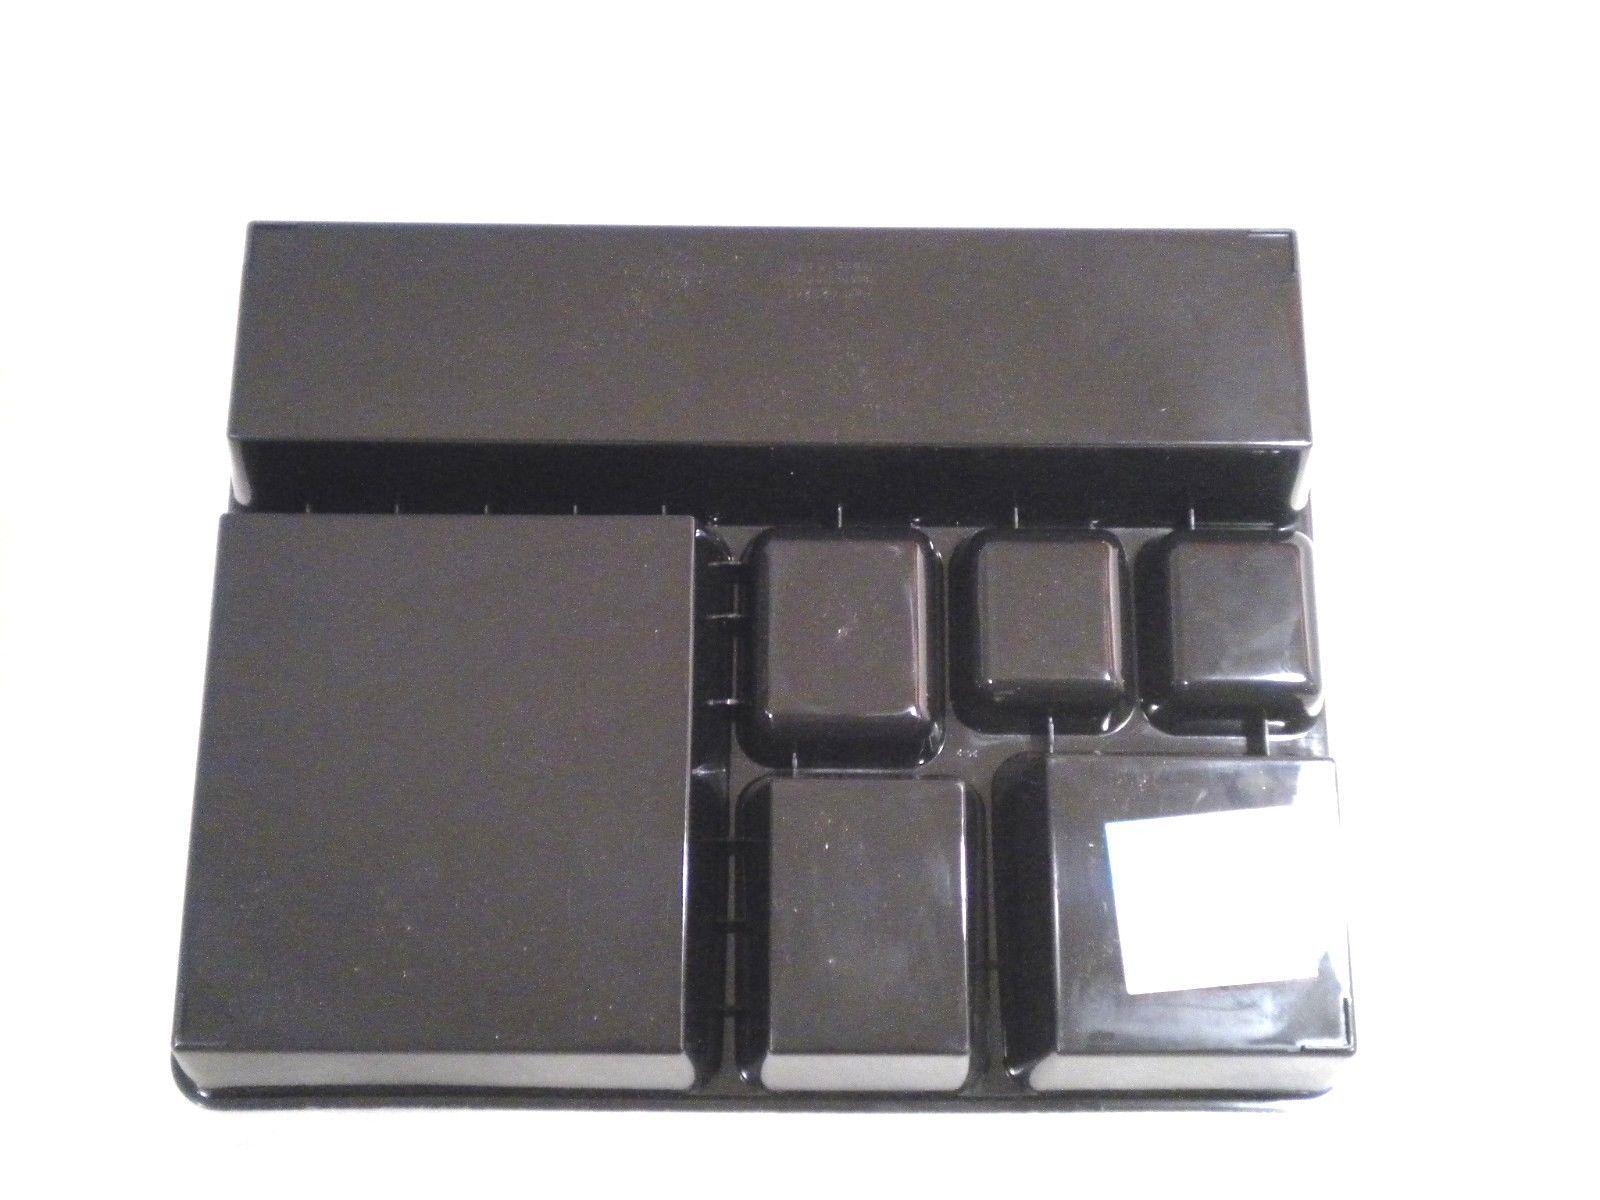 Black 2 5 deep office desk drawer organizer tray desk - Desk drawer organizer trays ...